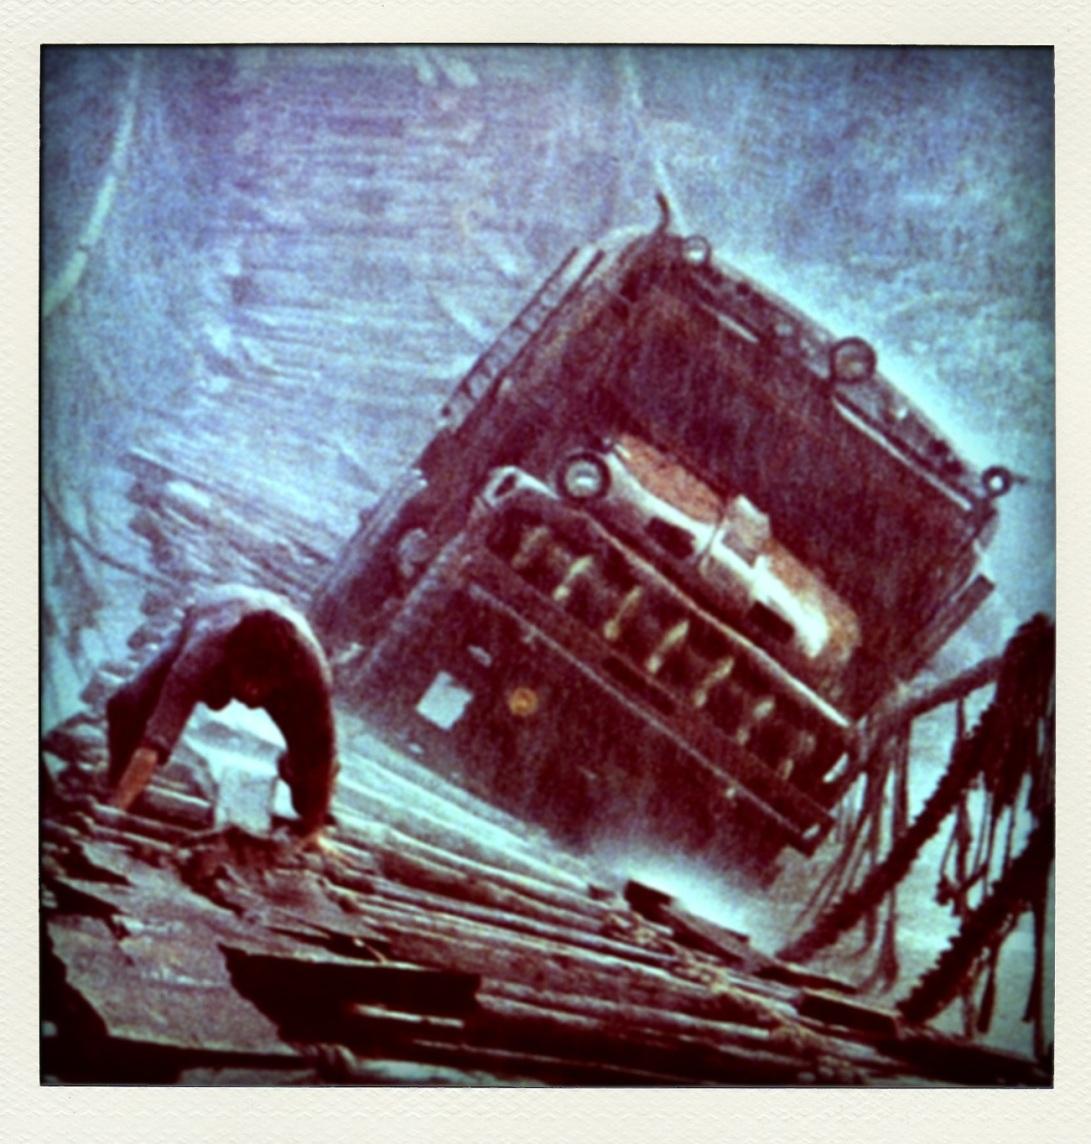 Sorcerer @ www.cinemascream.co.uk